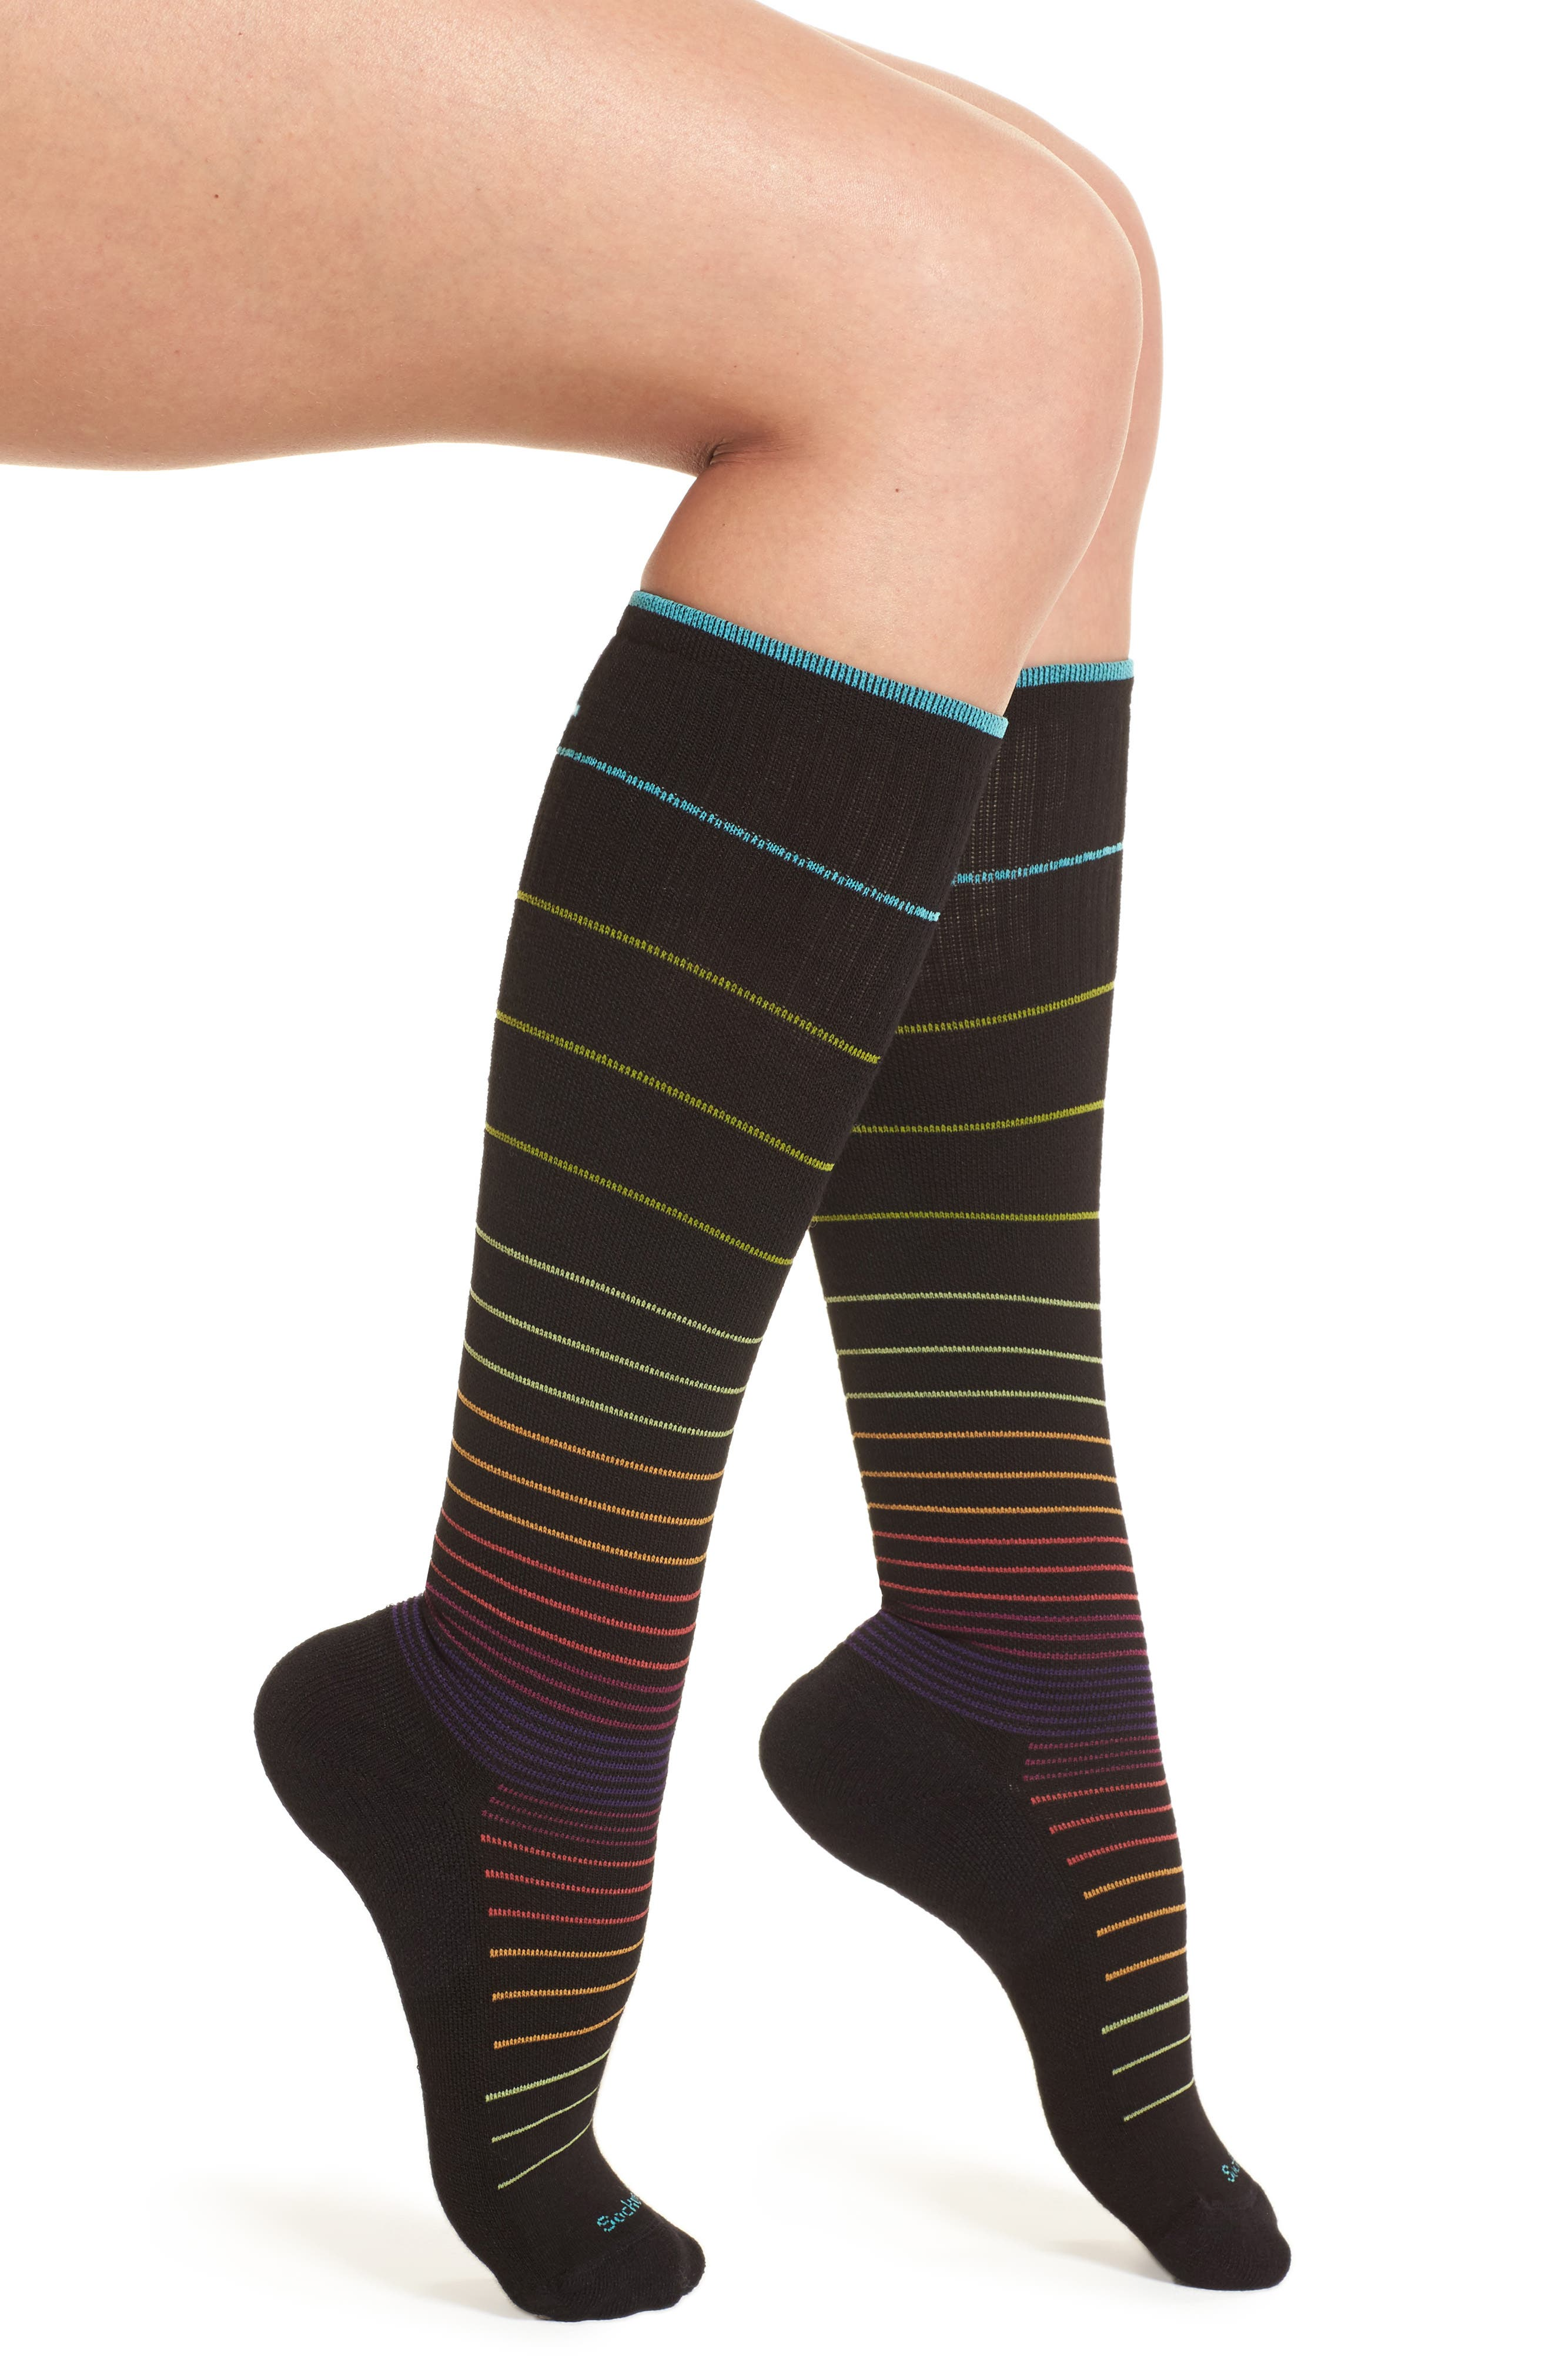 Circulator Compression Socks,                             Alternate thumbnail 2, color,                             BLACK STRIPE